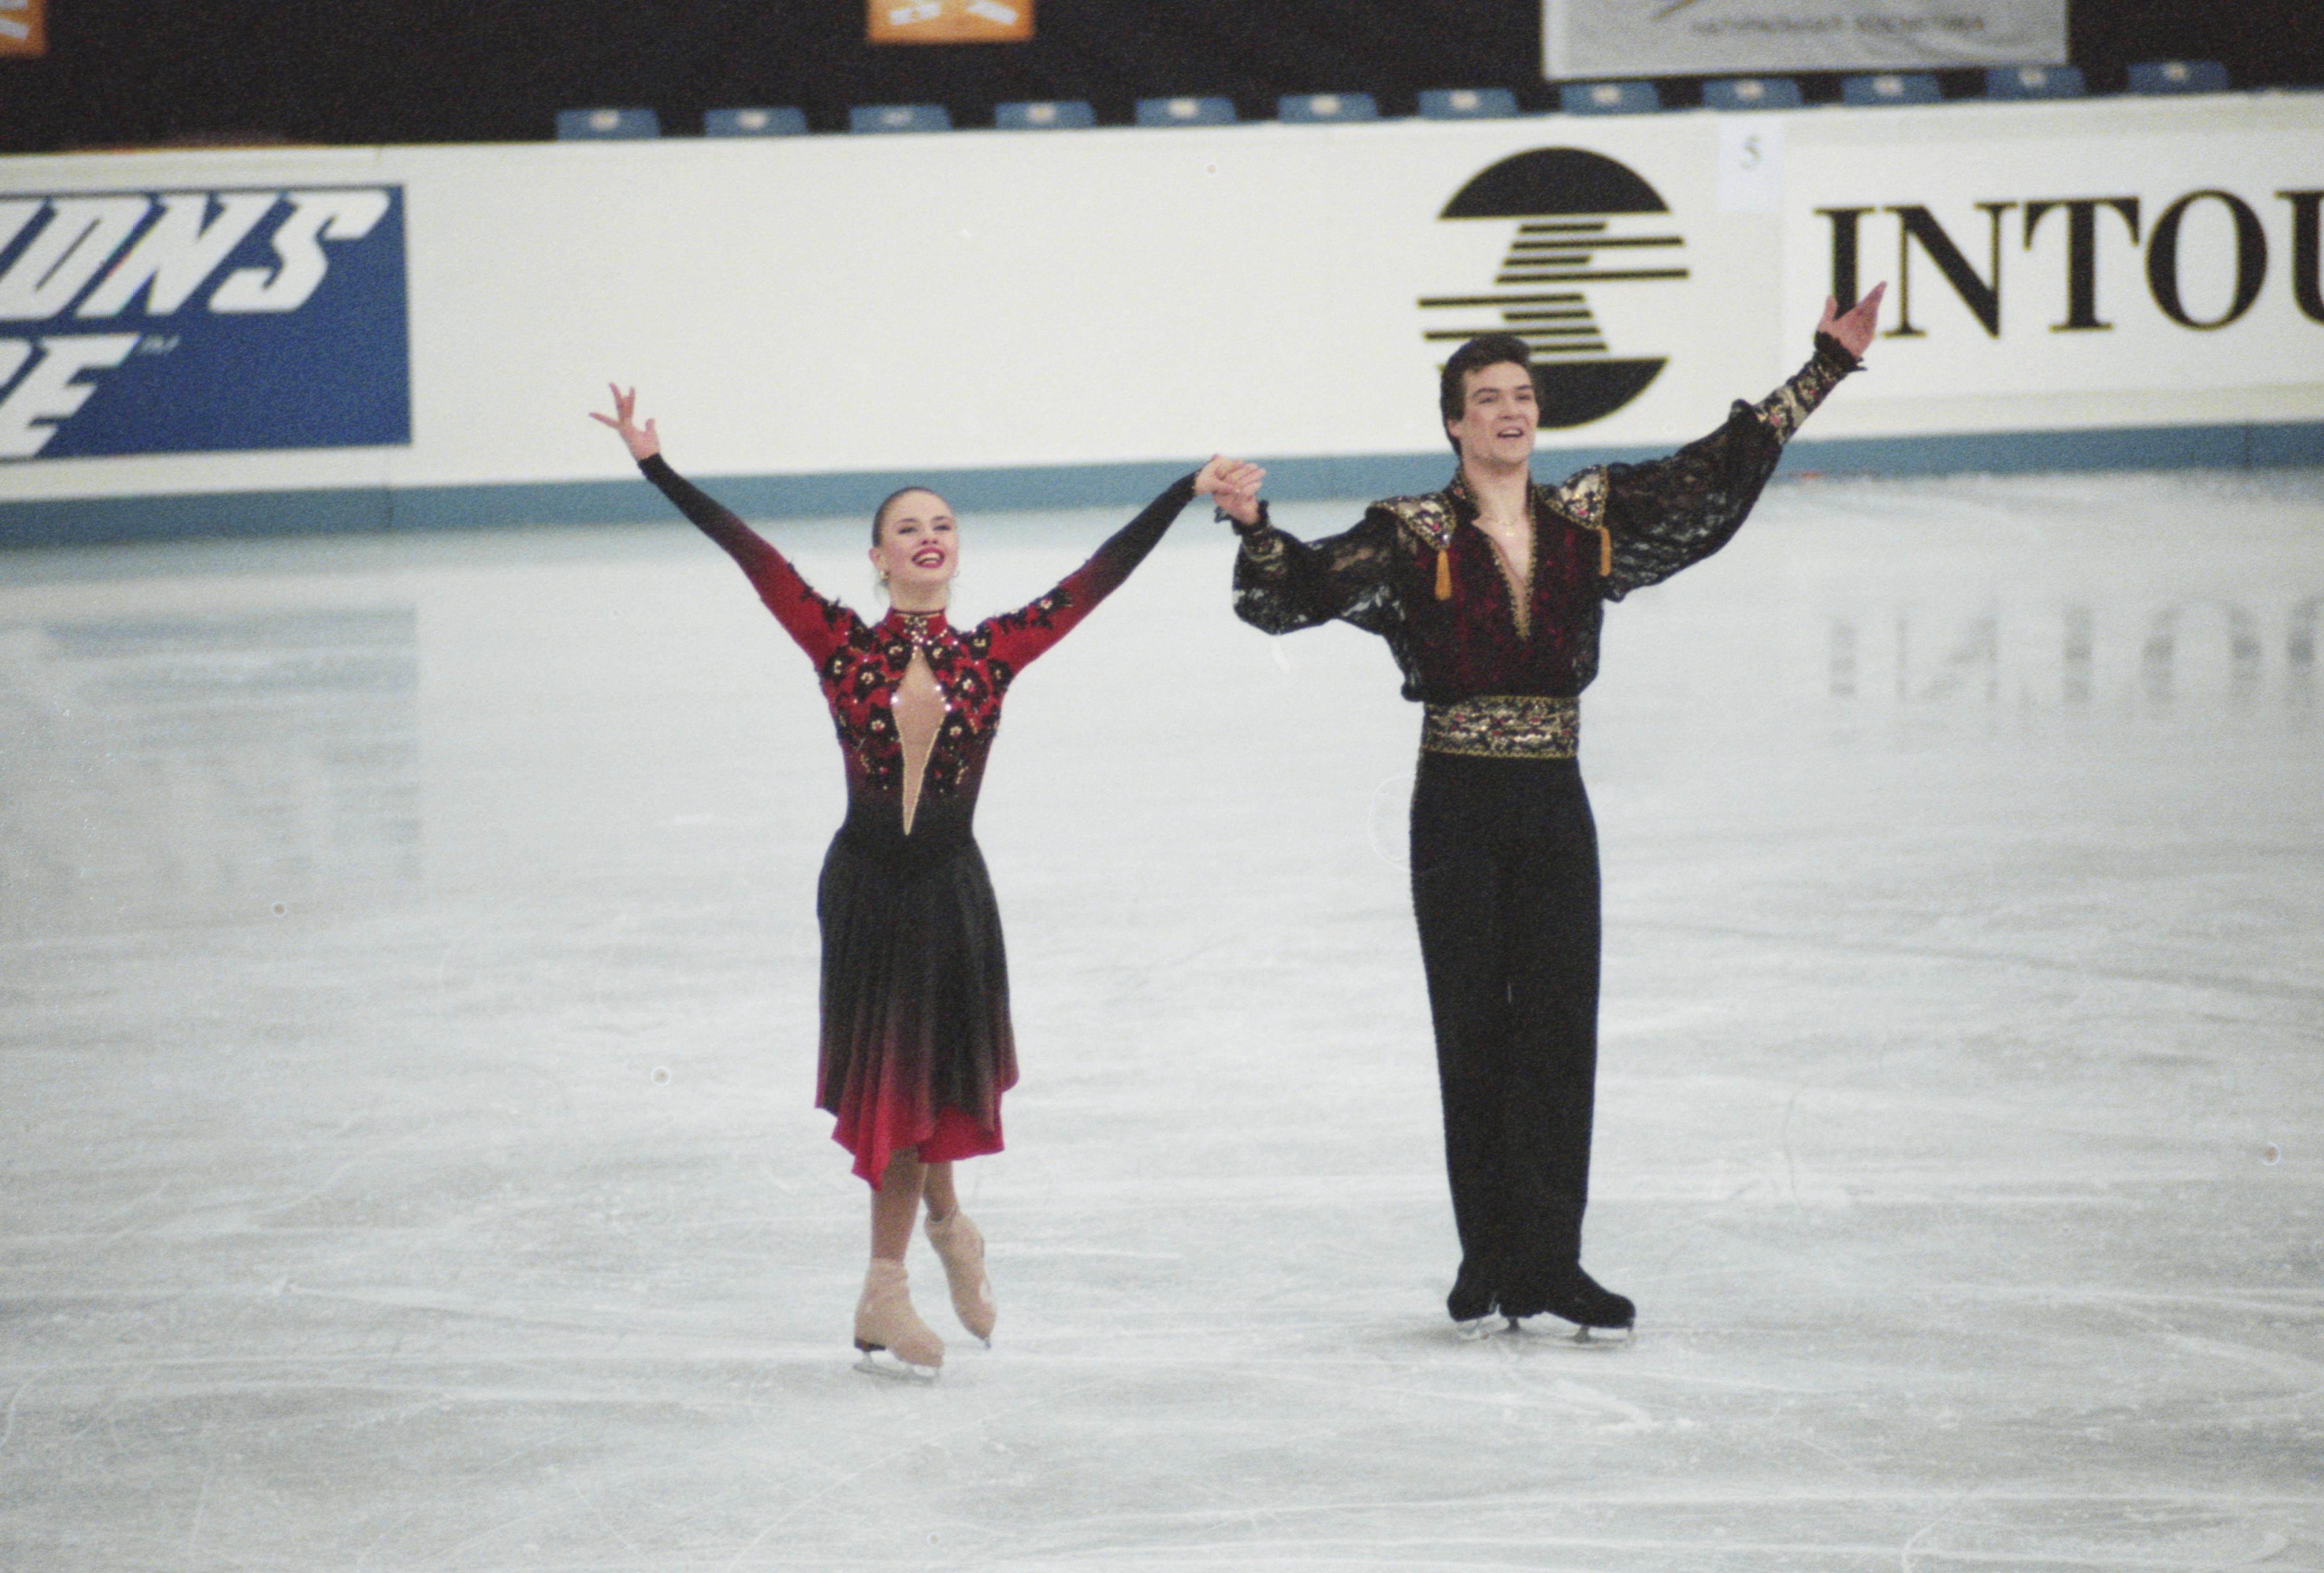 Анна Семенович и Владимир Фёдоров в 1997 году. Фото © Фотохроника ТАСС / Юрий Белинский